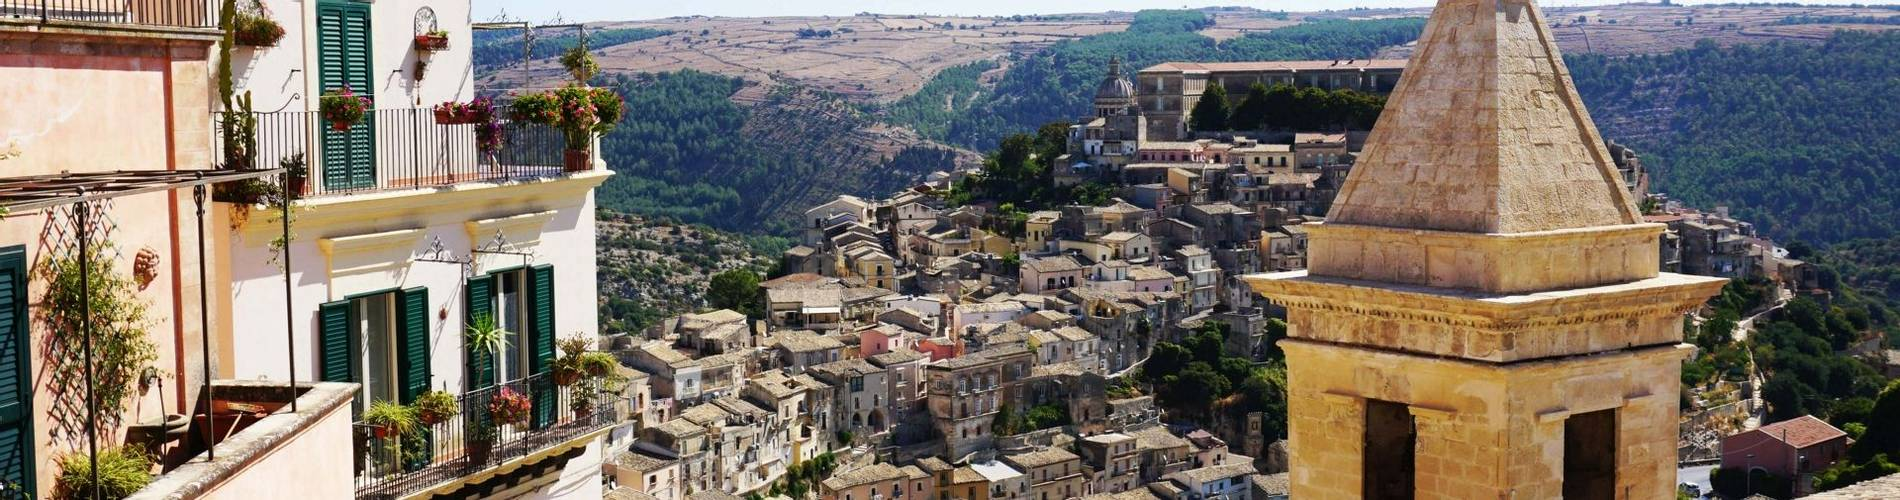 Villa Del Lauro, Sicily, Italy (14).jpg